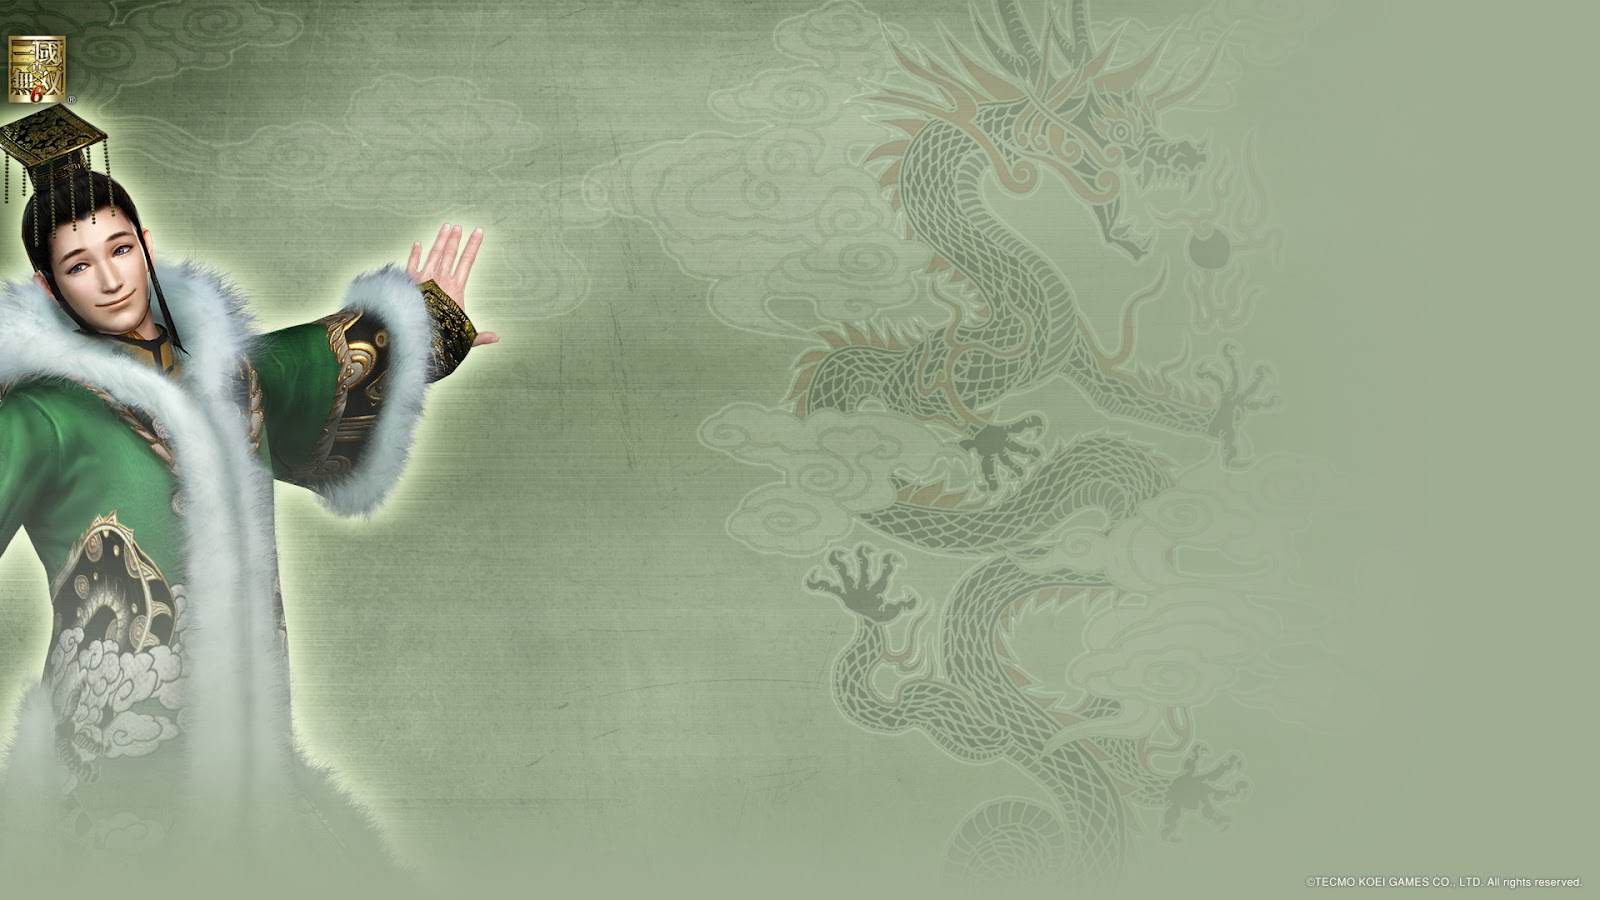 wallpaper: Dynasty Warriors Wallpaper Hd